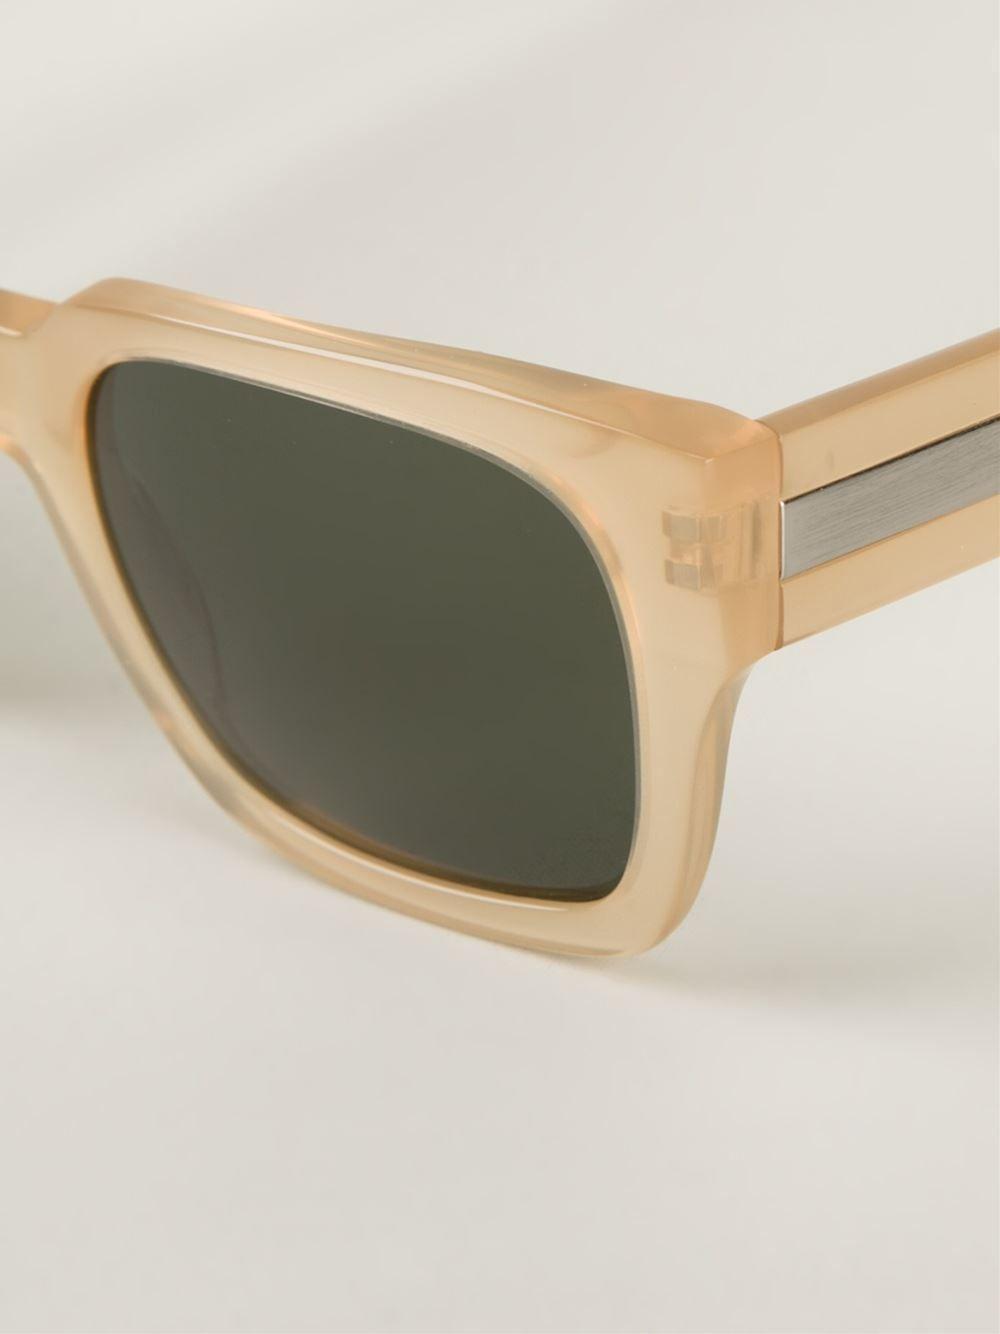 6333712ced75a Marni wayfarer sunglasses from Farfetch